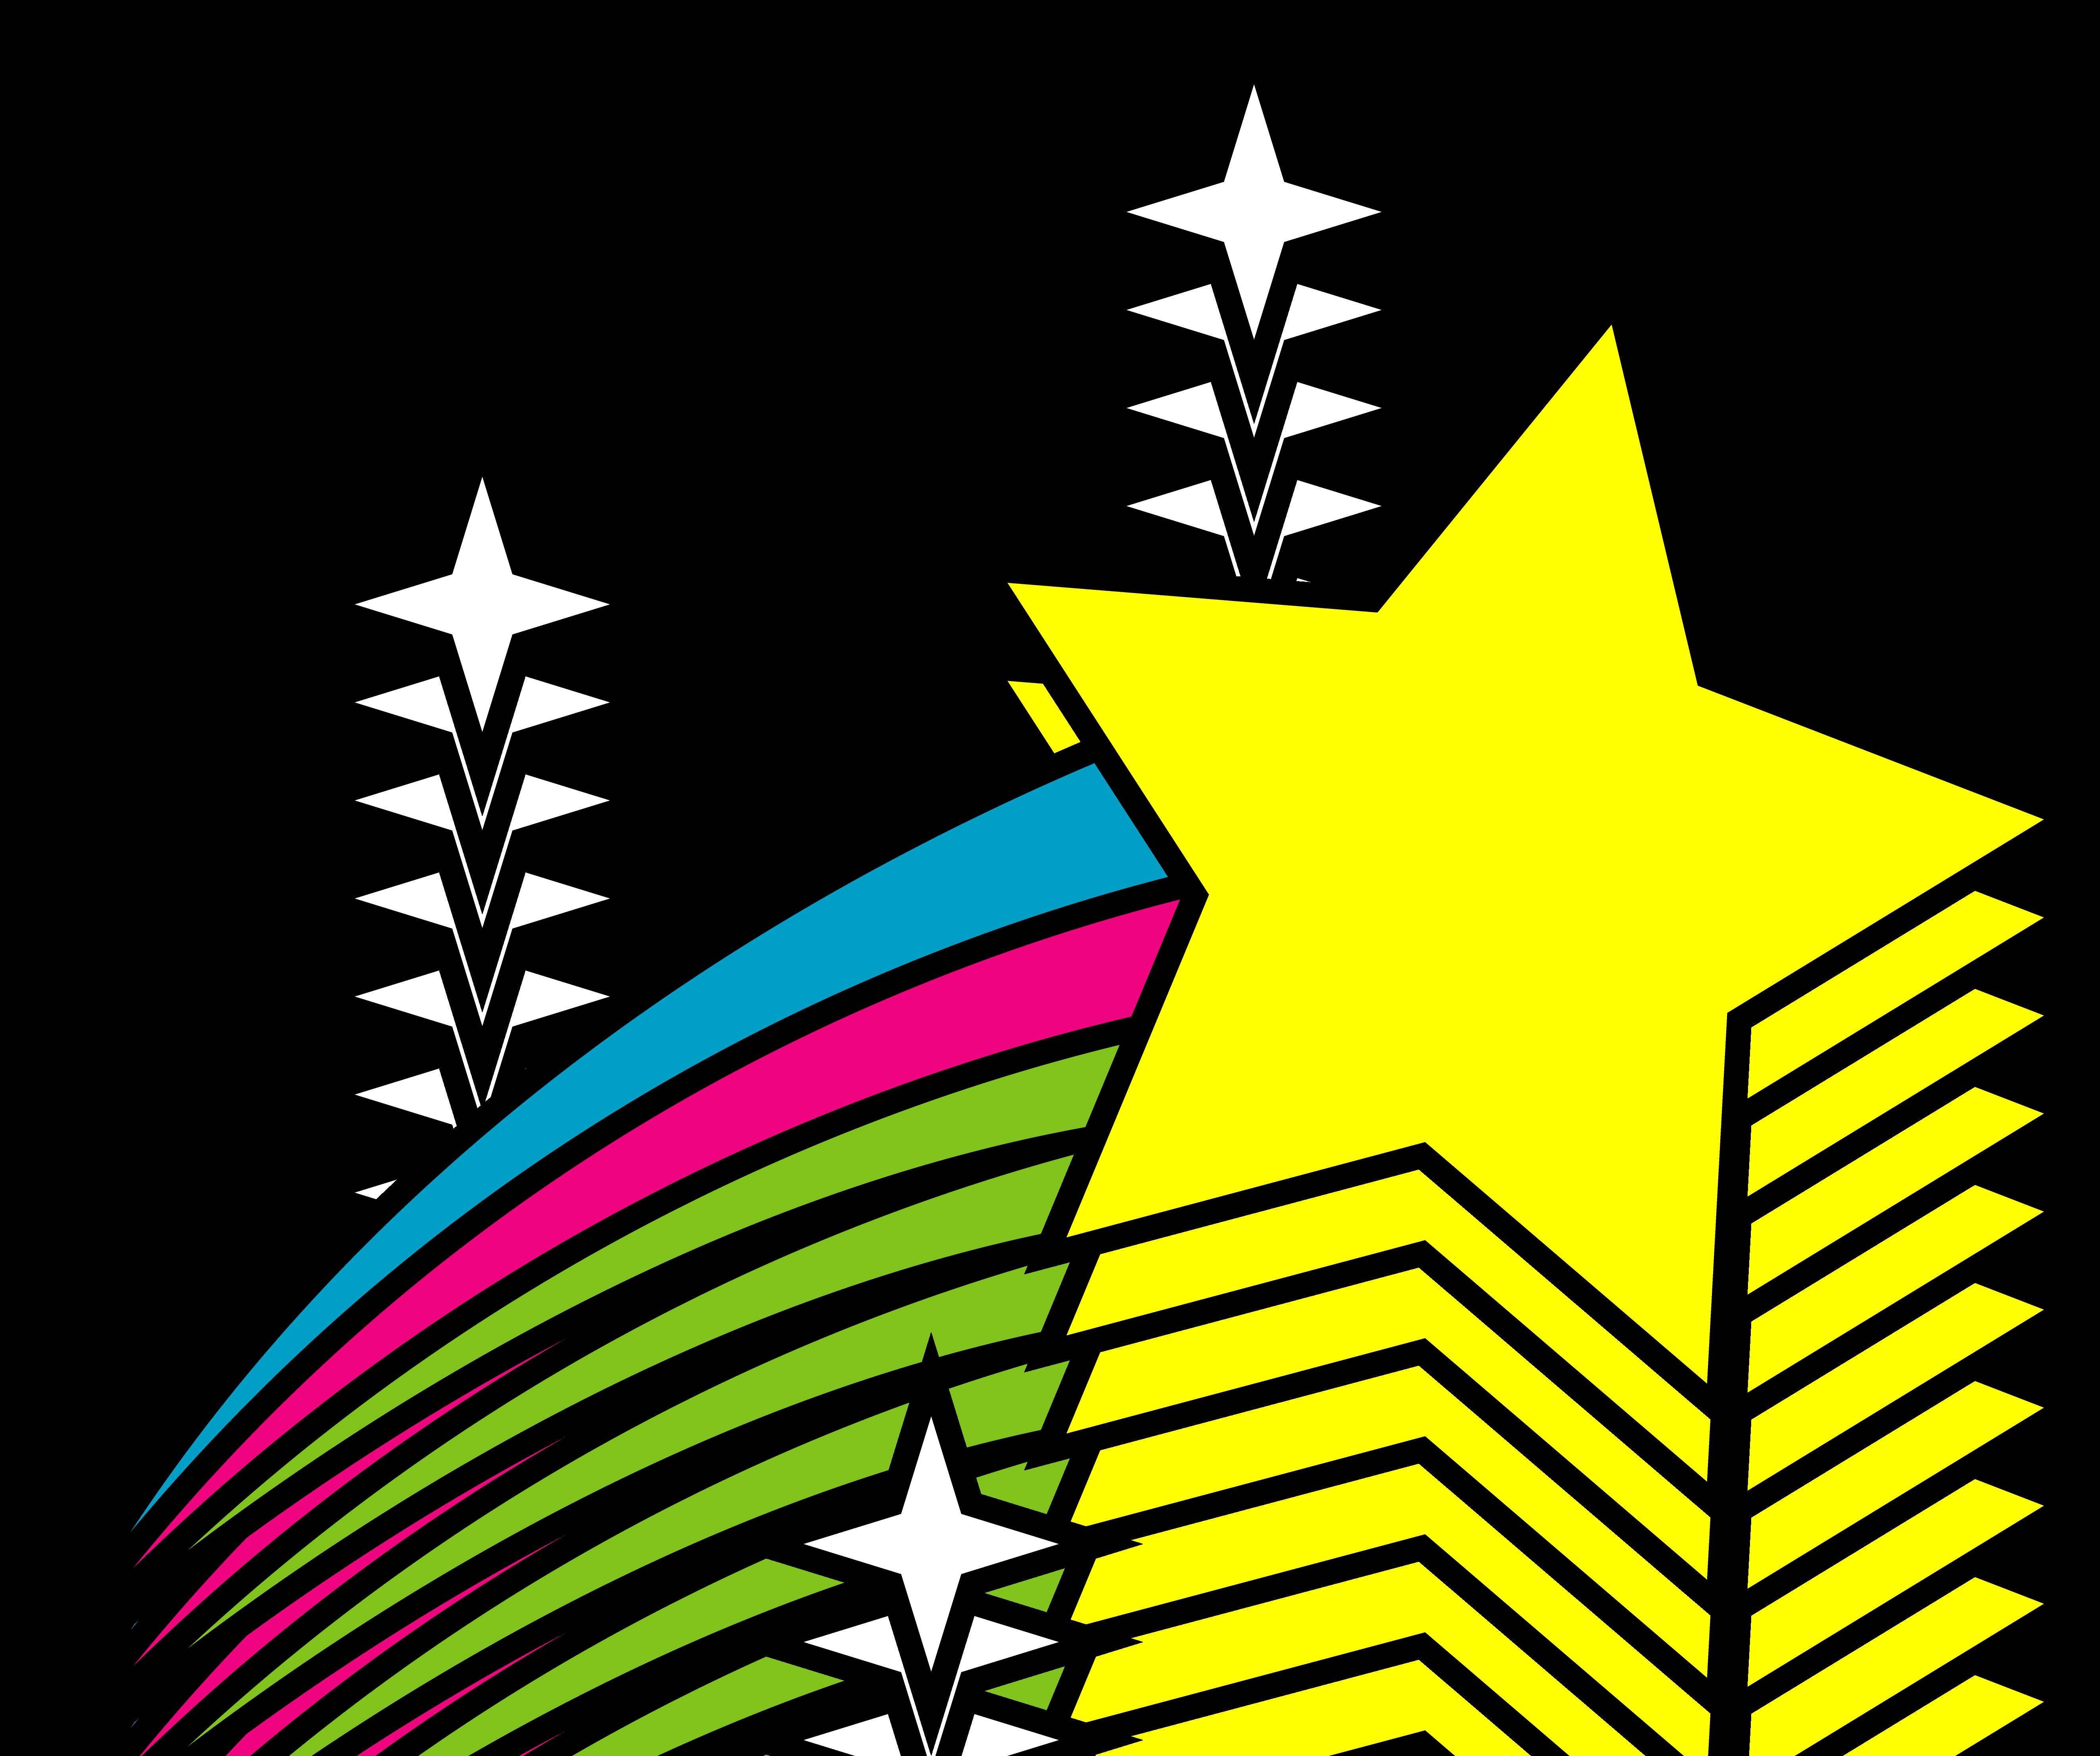 Clipart Star-clipart star-3